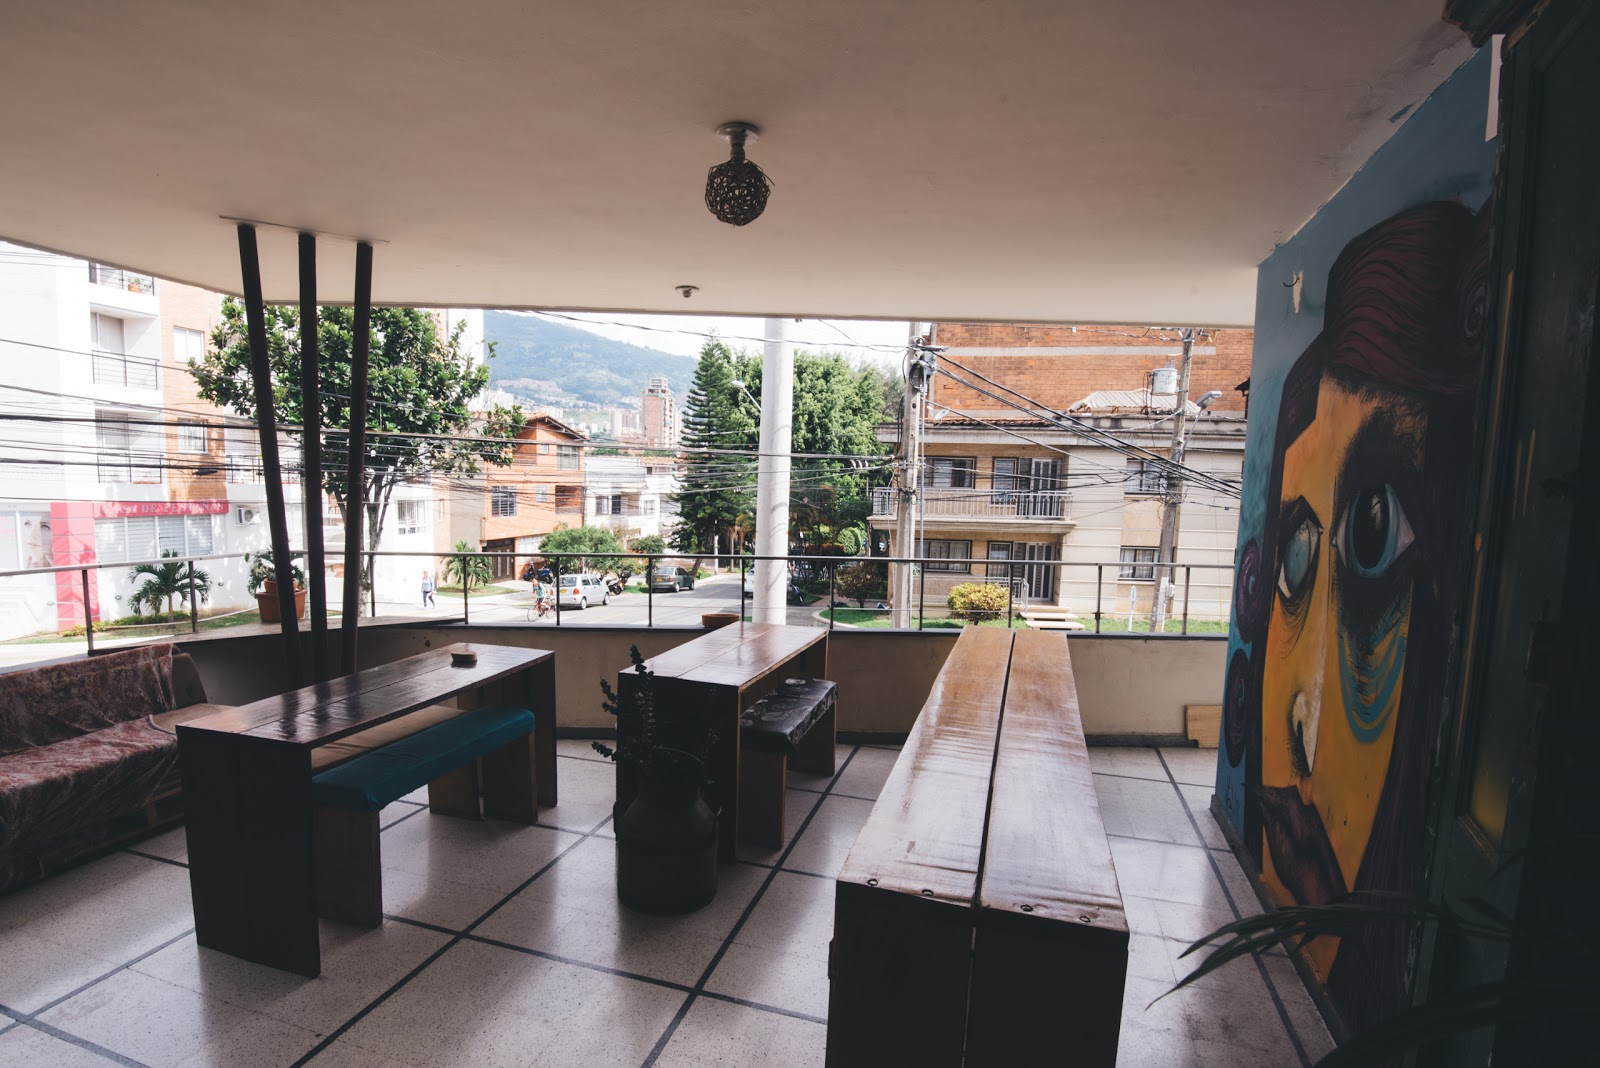 Café Ondas: A Work-Friendly Place in Medellin